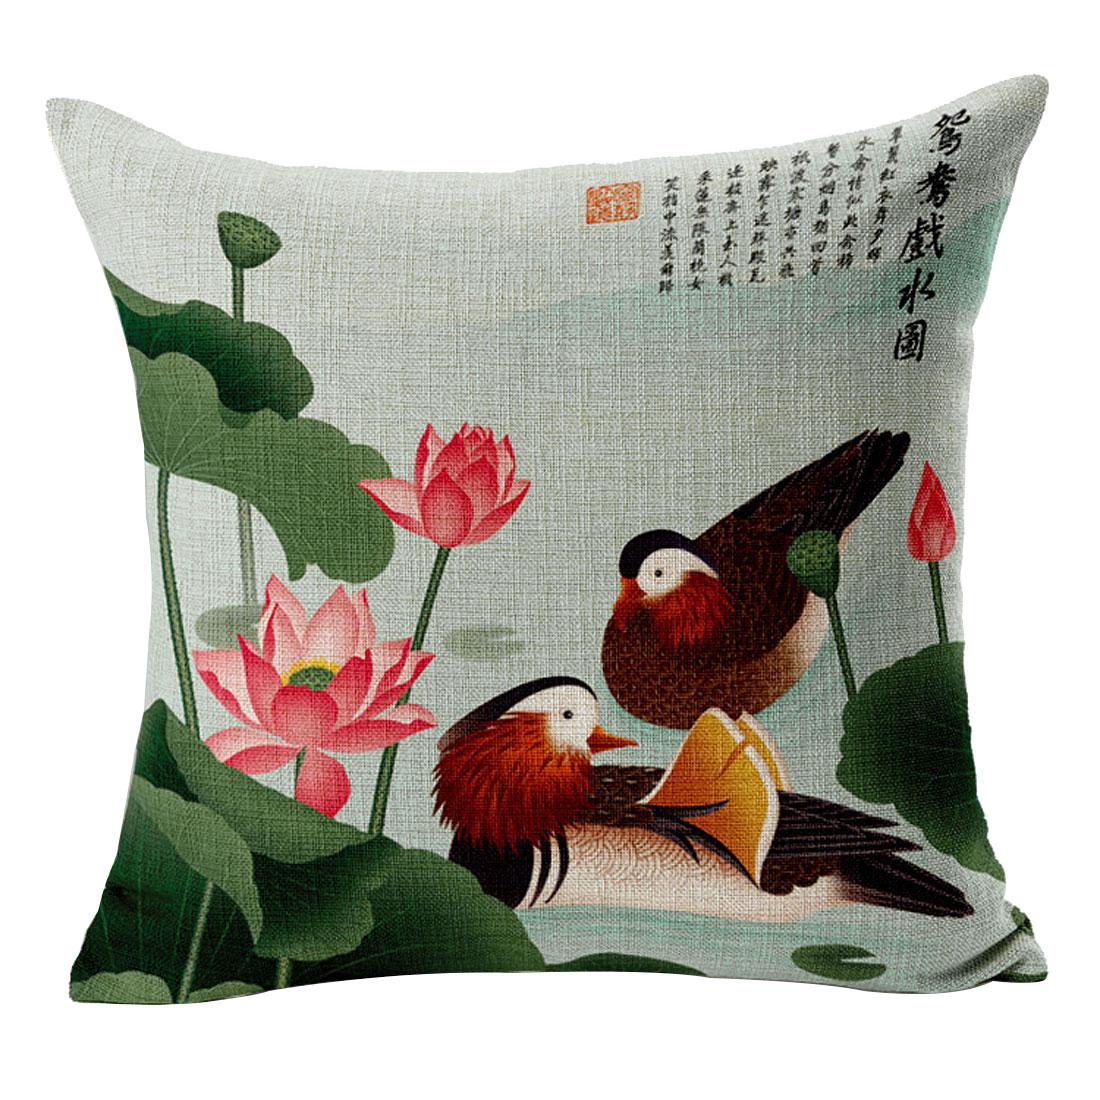 Sofa Cotton Linen Lotus Mandarin Duck Pattern Waist Throw Cushion Cover Pillow Case